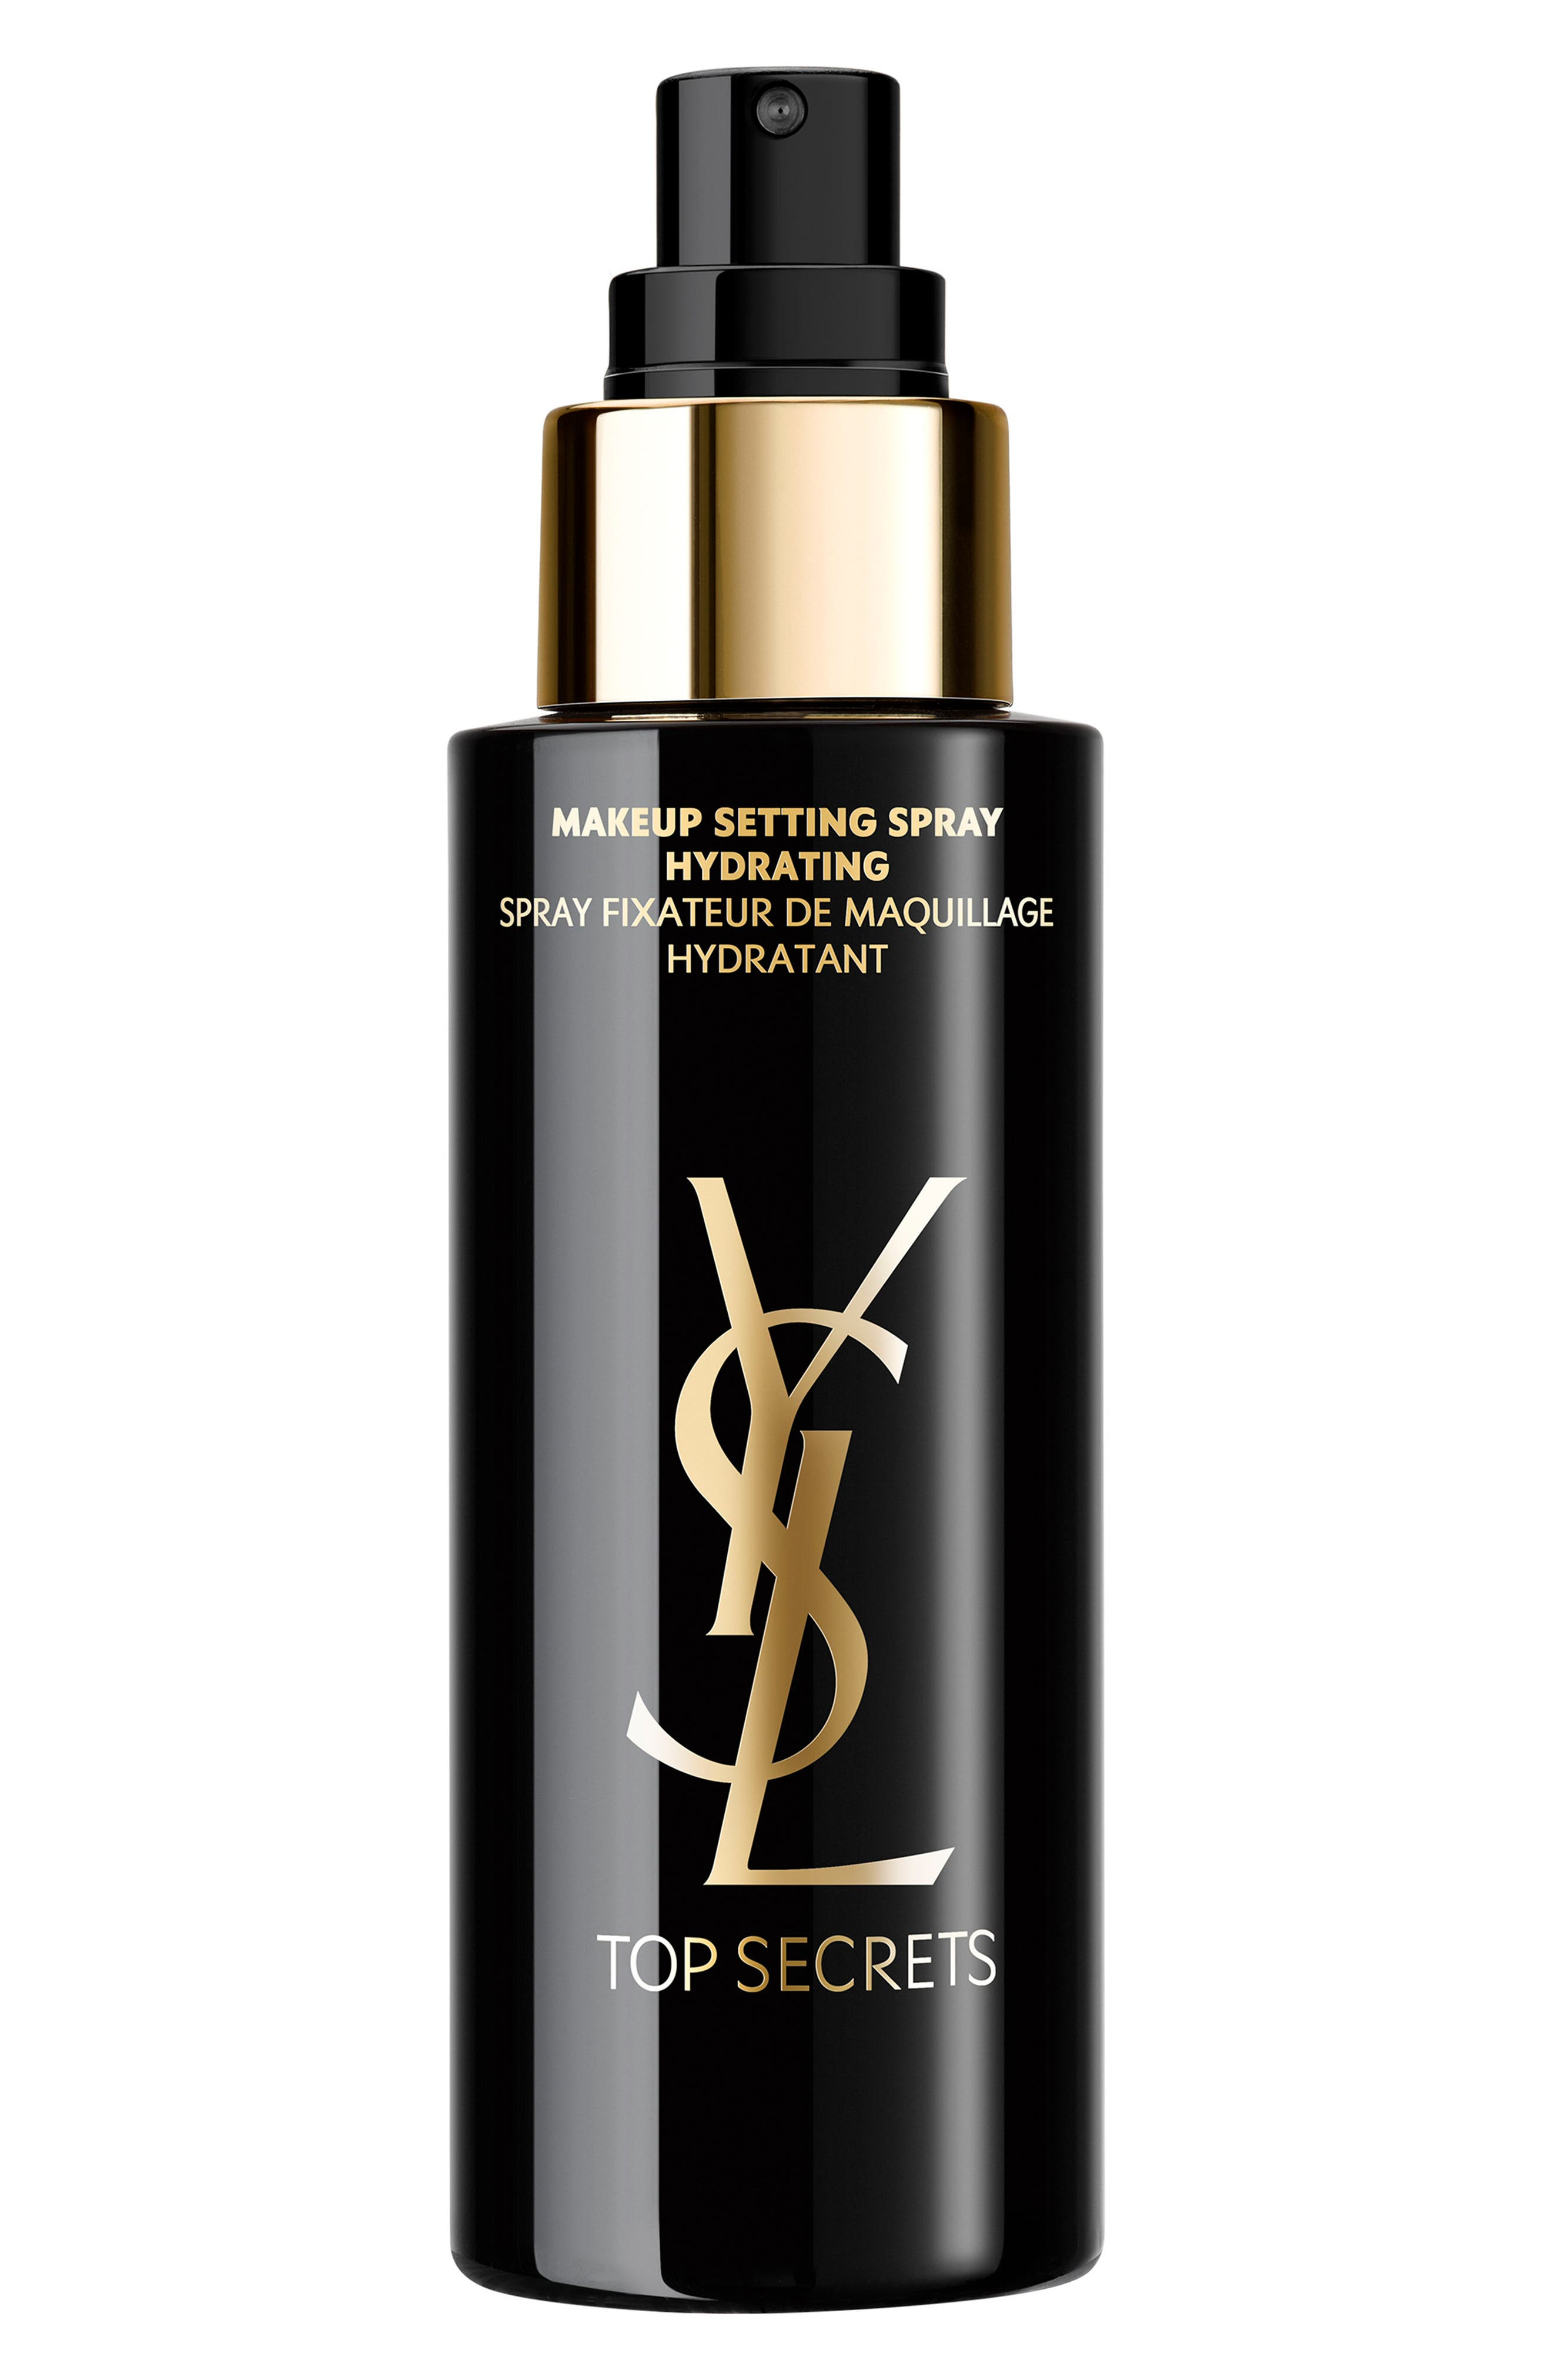 YVES SAINT LAURENT, Top Secrets Glow Perfecting Makeup Setting Spray, Main thumbnail 1, color, NO COLOR